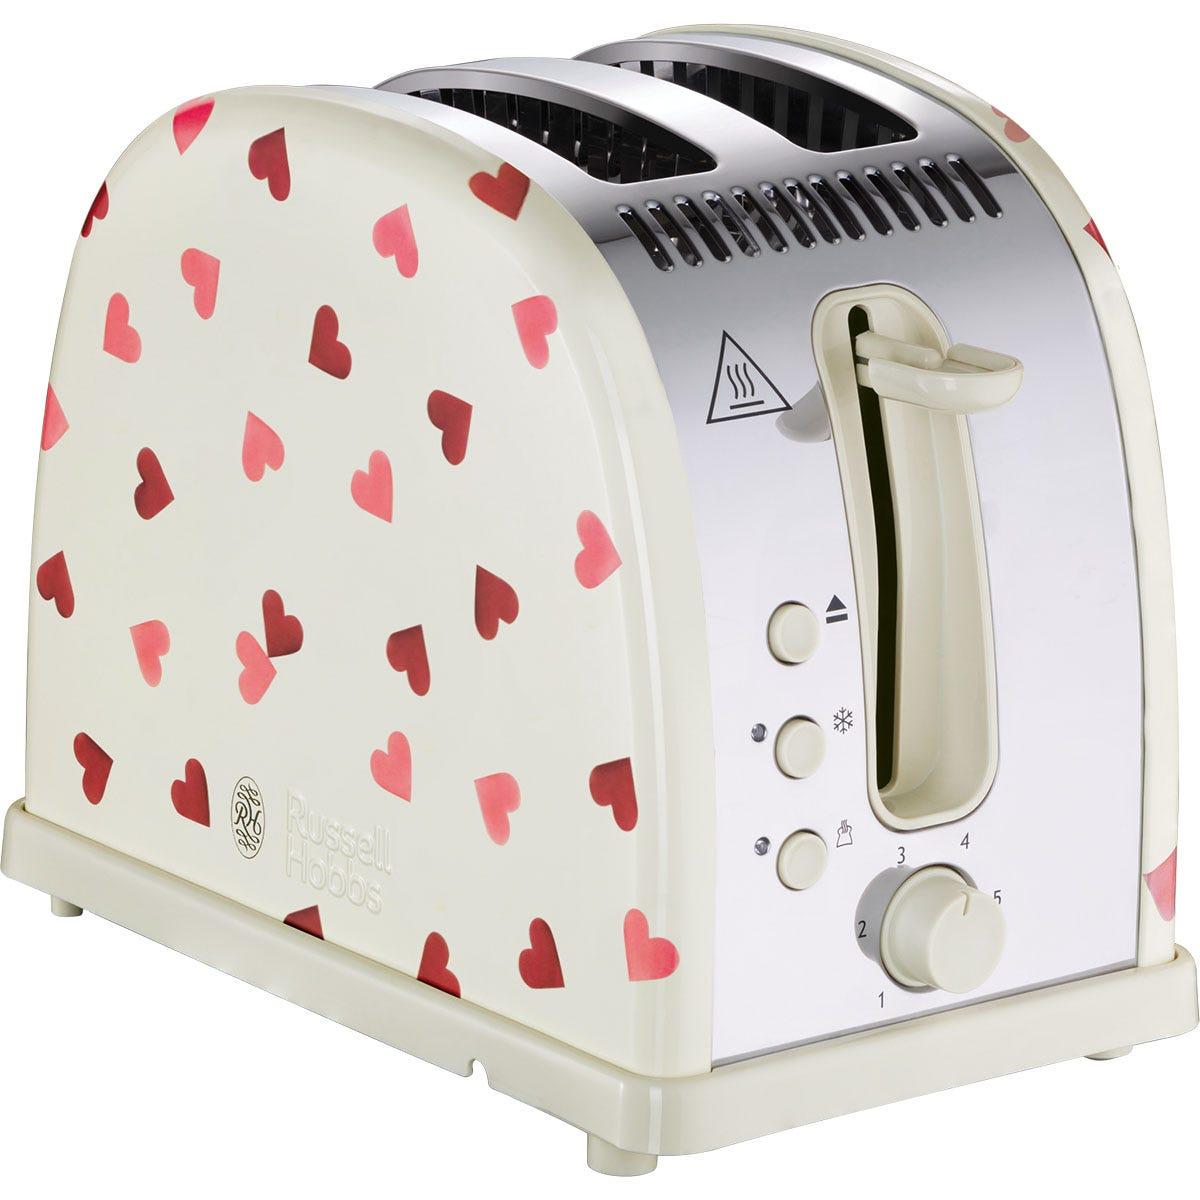 Russell Hobbs 28340 Emma Bridgewater Pink Hearts 2-Slice Toaster - Cream and Pink